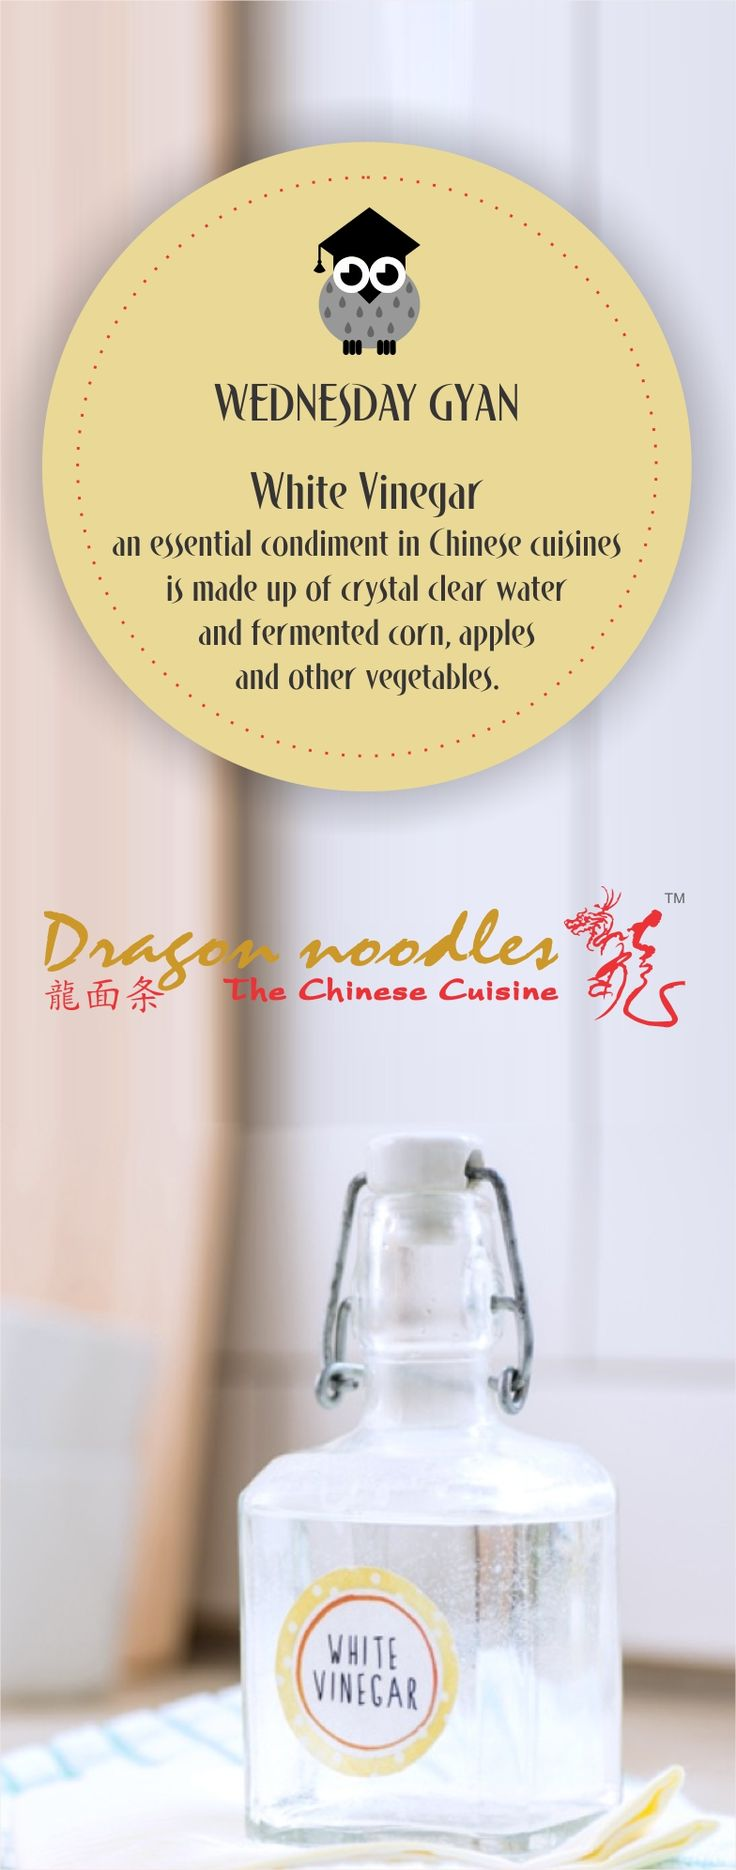 Did you know what is white Vinegar made of? #WhiteVinegar  #WednesdayGyan #DragonNoodles #Chinese #Food #foodies #vaishali #indirapuram